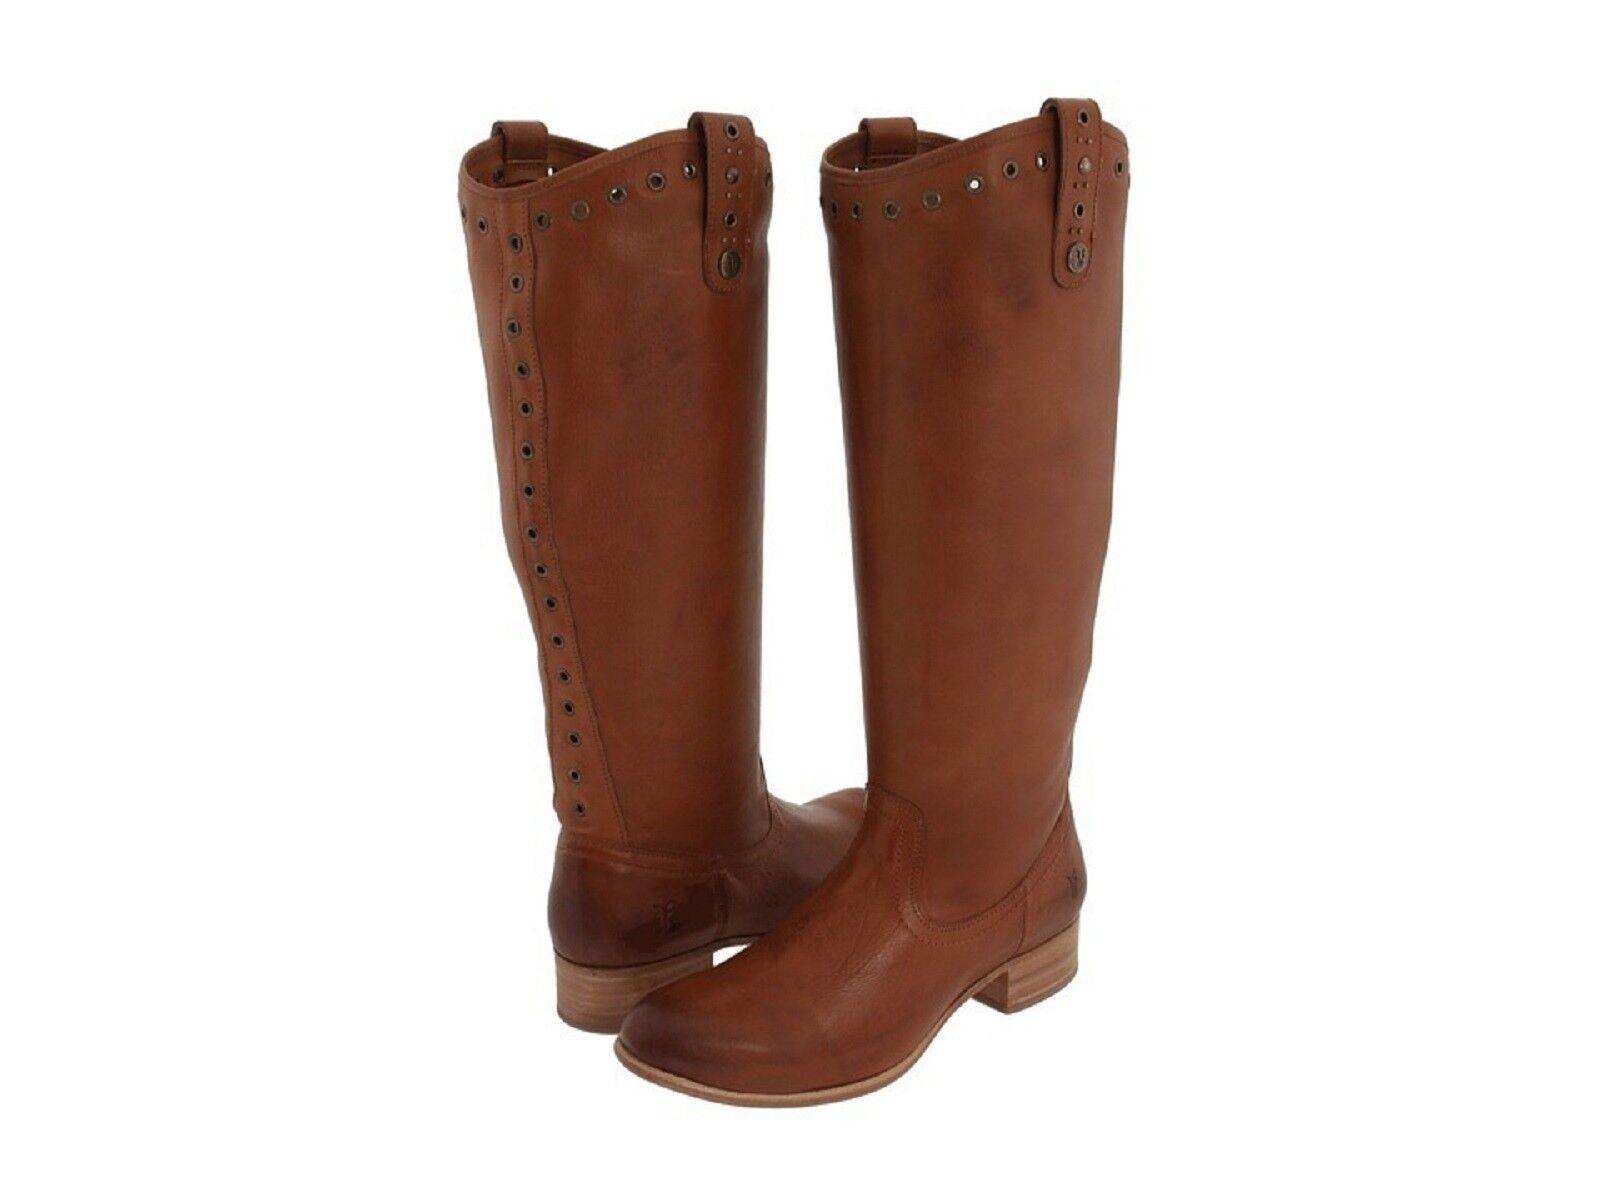 Frye AMELIA Grommet Tall Leather Boots Cognac 6M Women Knee High New